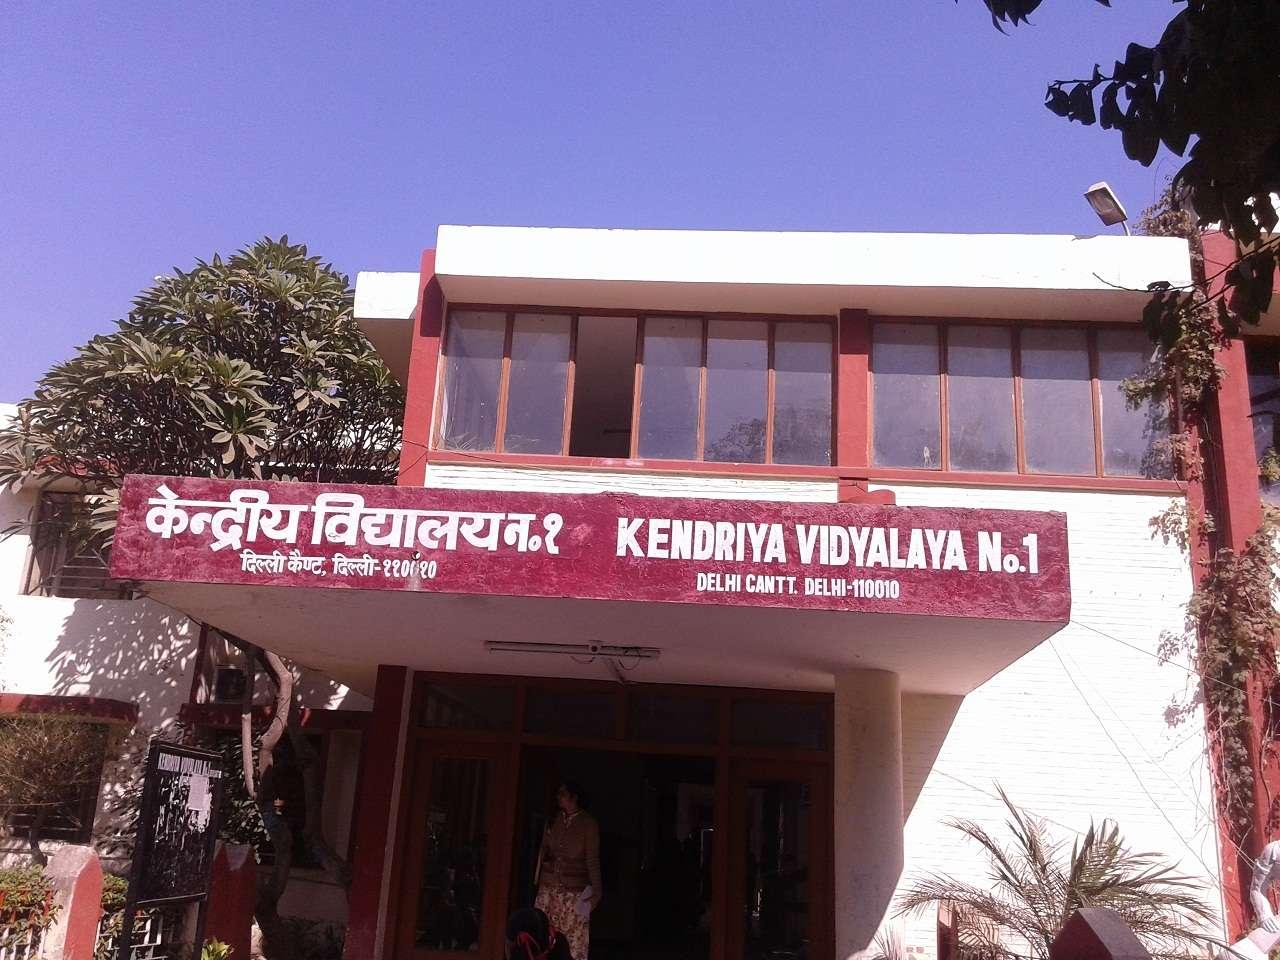 KENDRIYA VIDYALAYA NO 1 SADAR BAZAR ROAD DELHI CANTT NEW DELHI 2700006